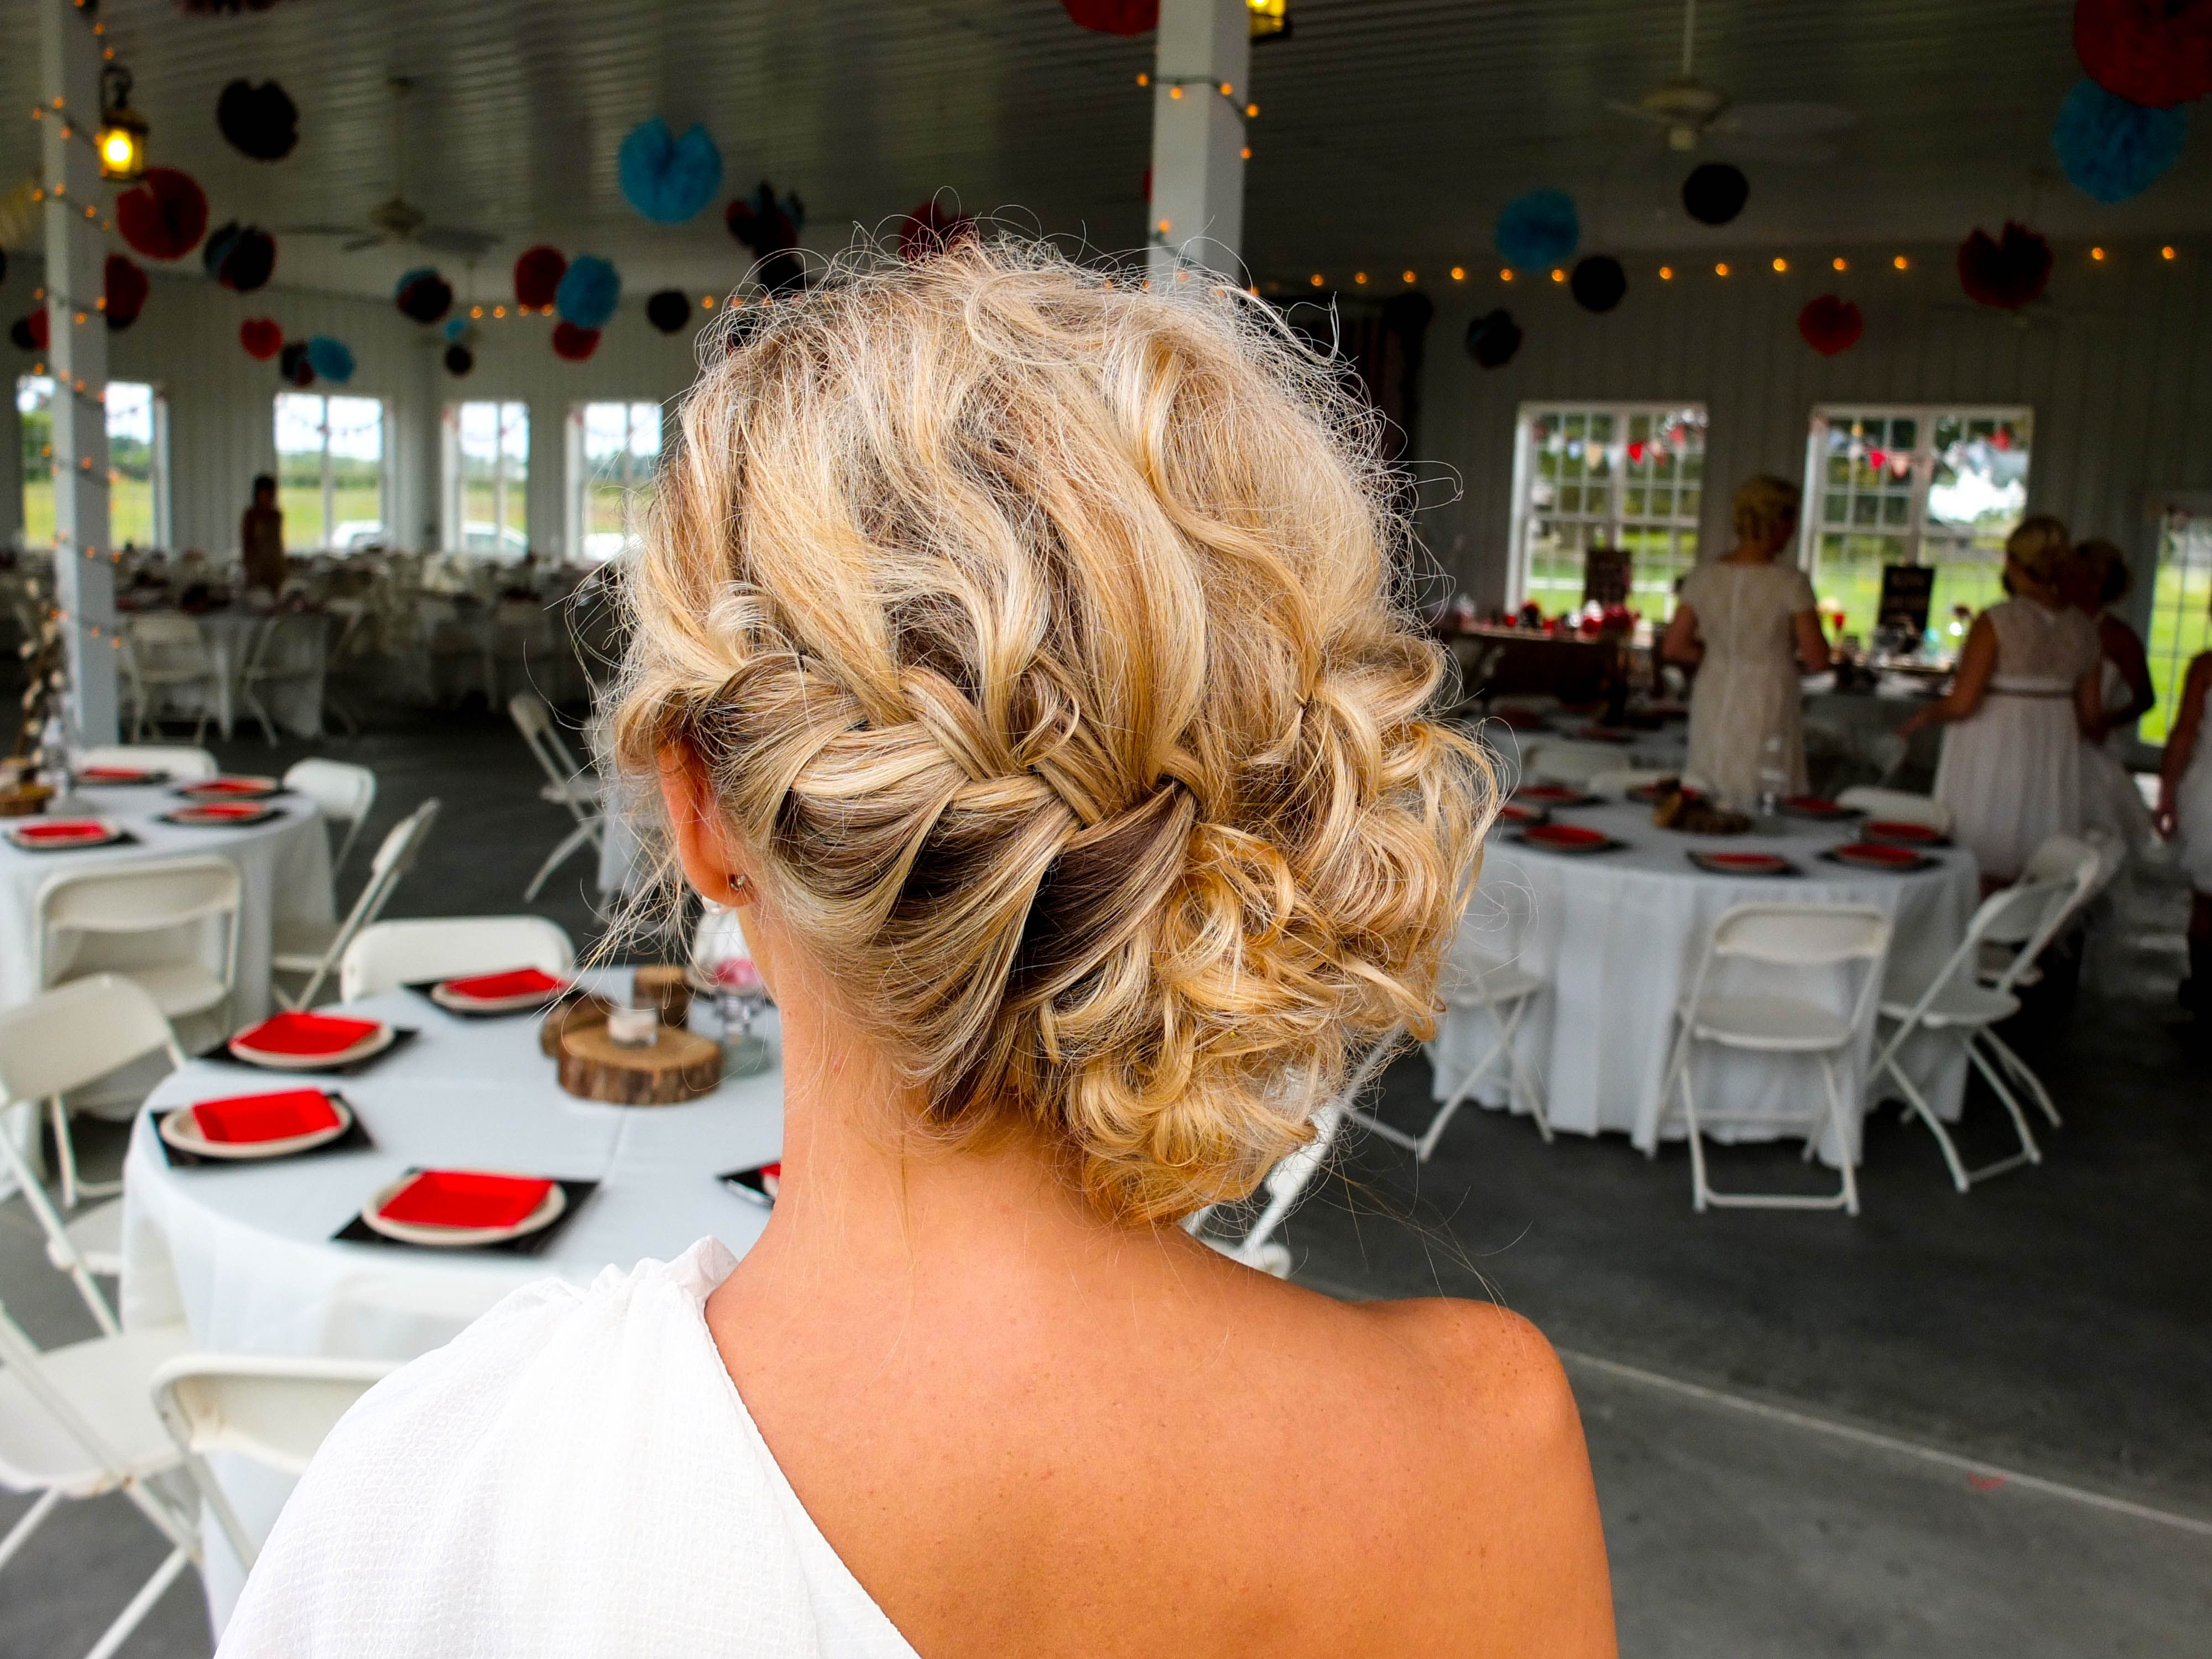 A bridesmaid hairstyle for an outdoor rustic wedding matriiii